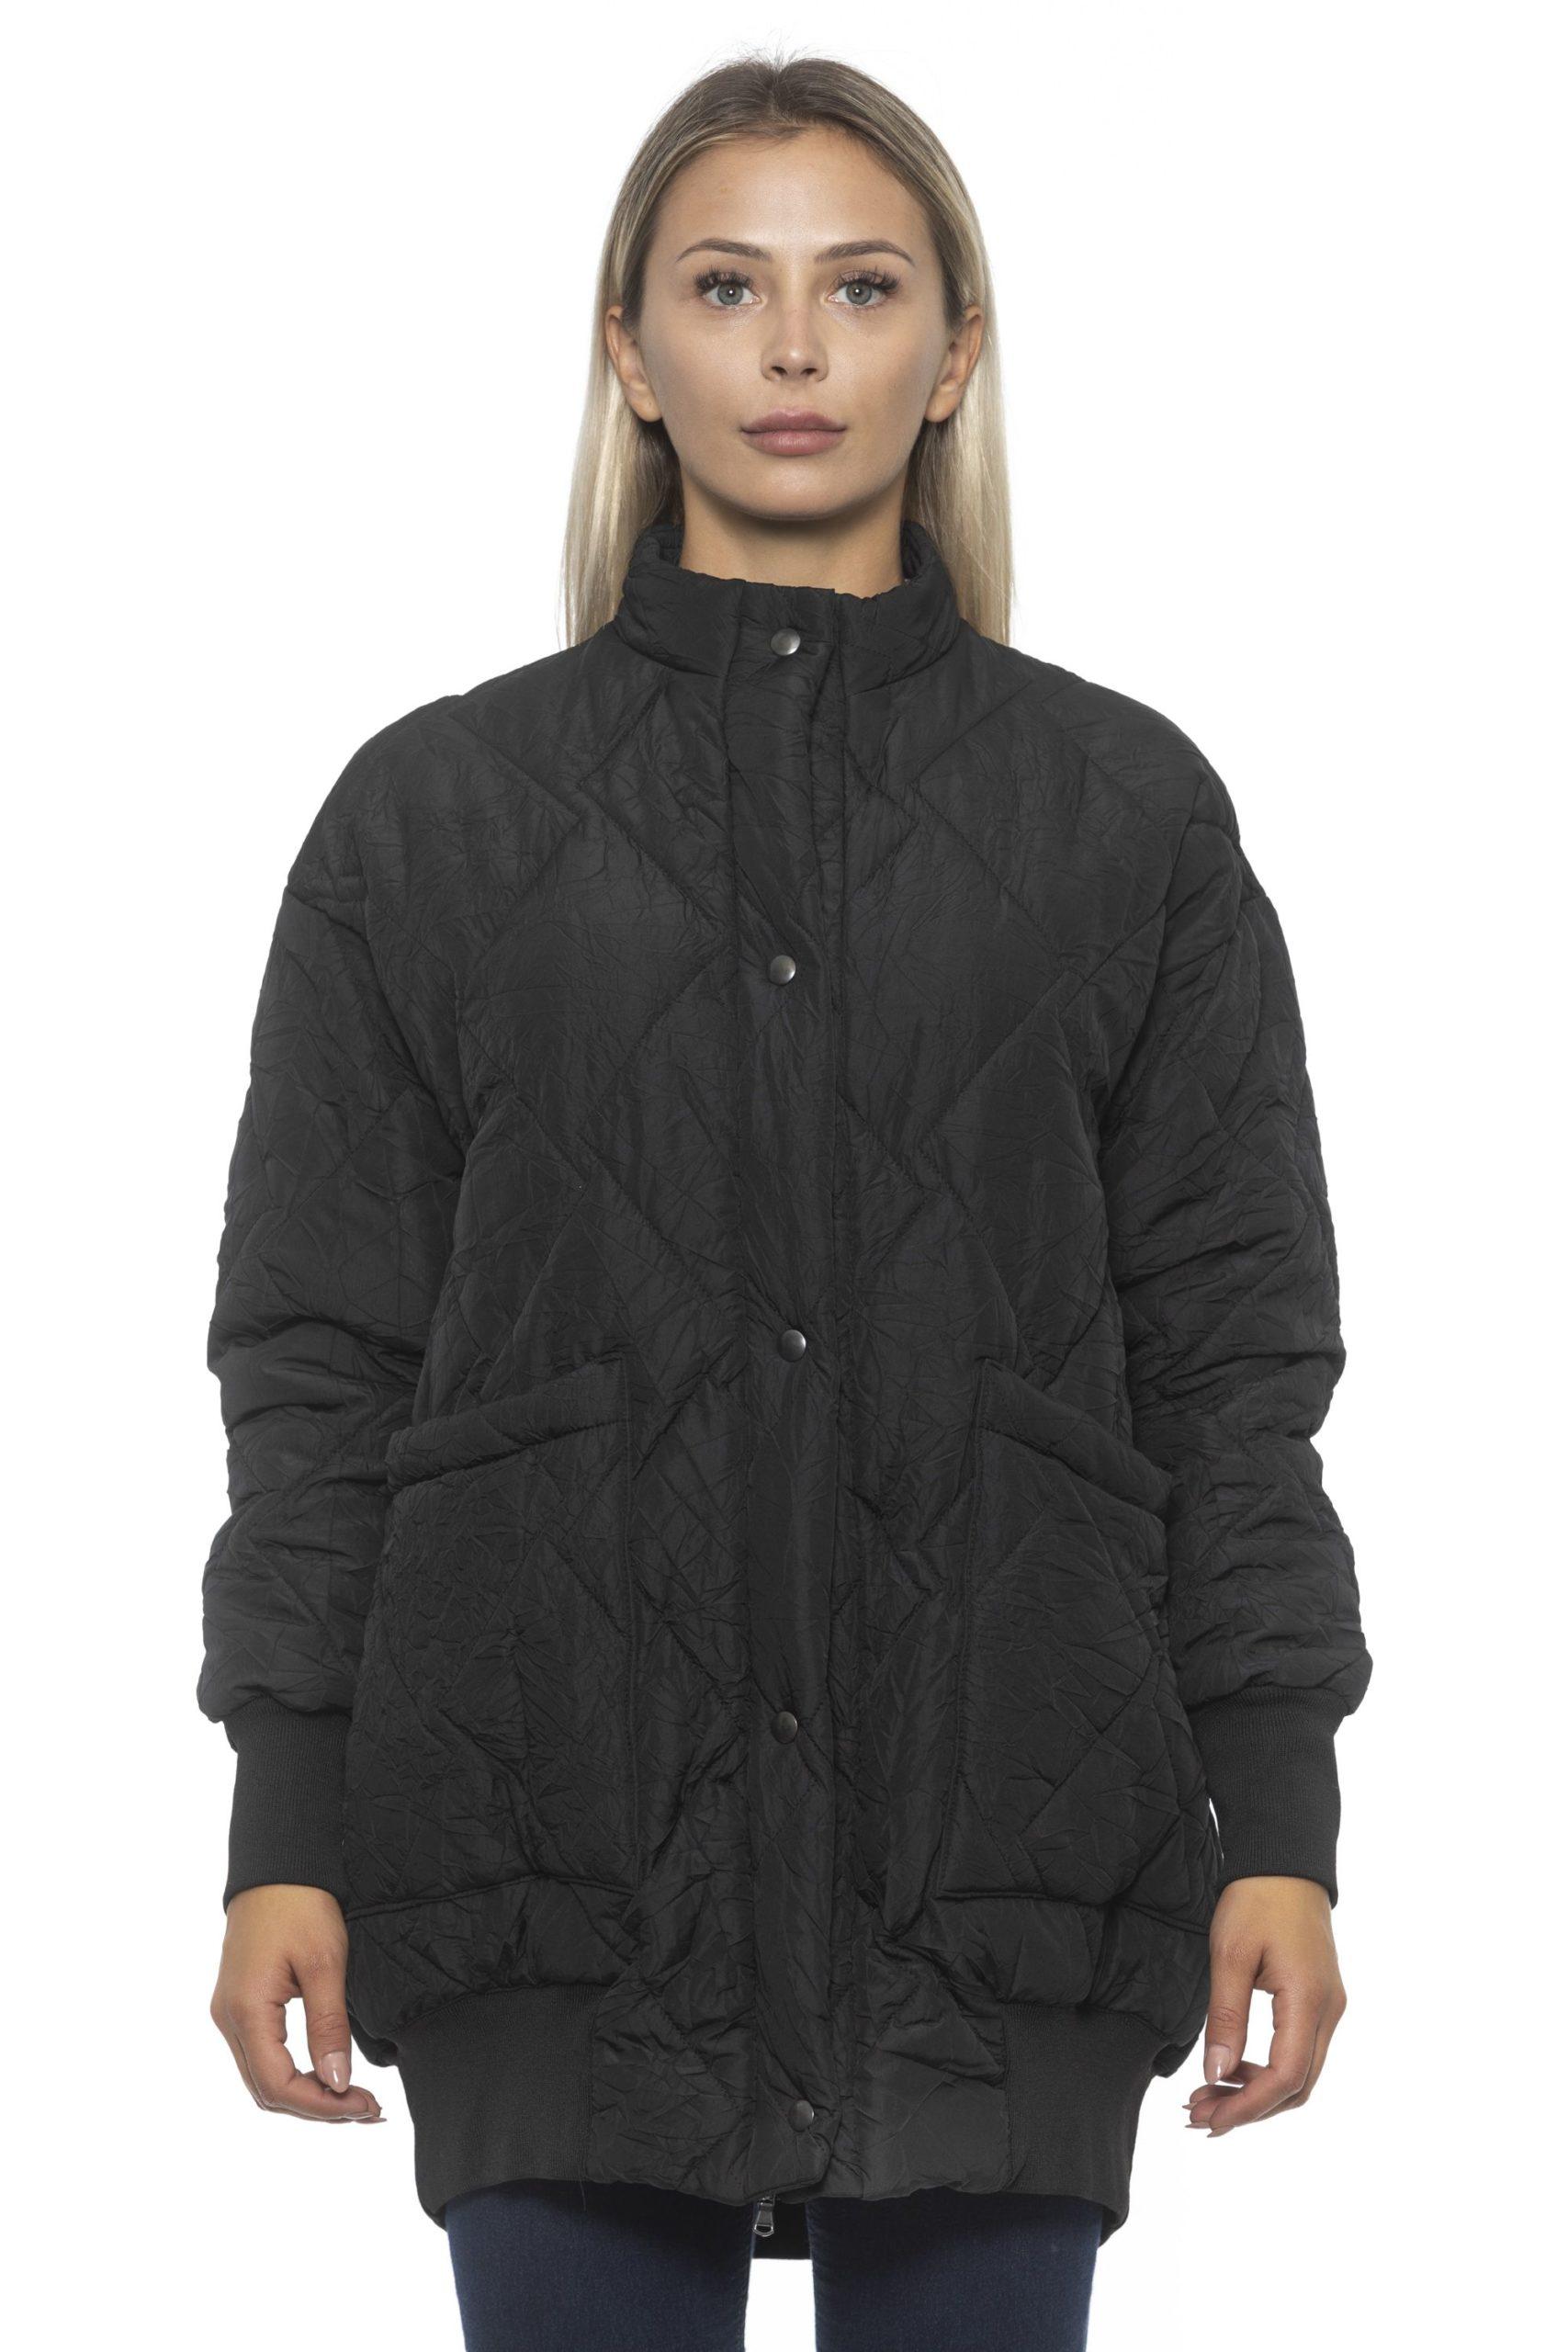 Alpha Studio Women's V A R. U N I C A Coat Black AL1192145 - IT40 | XS